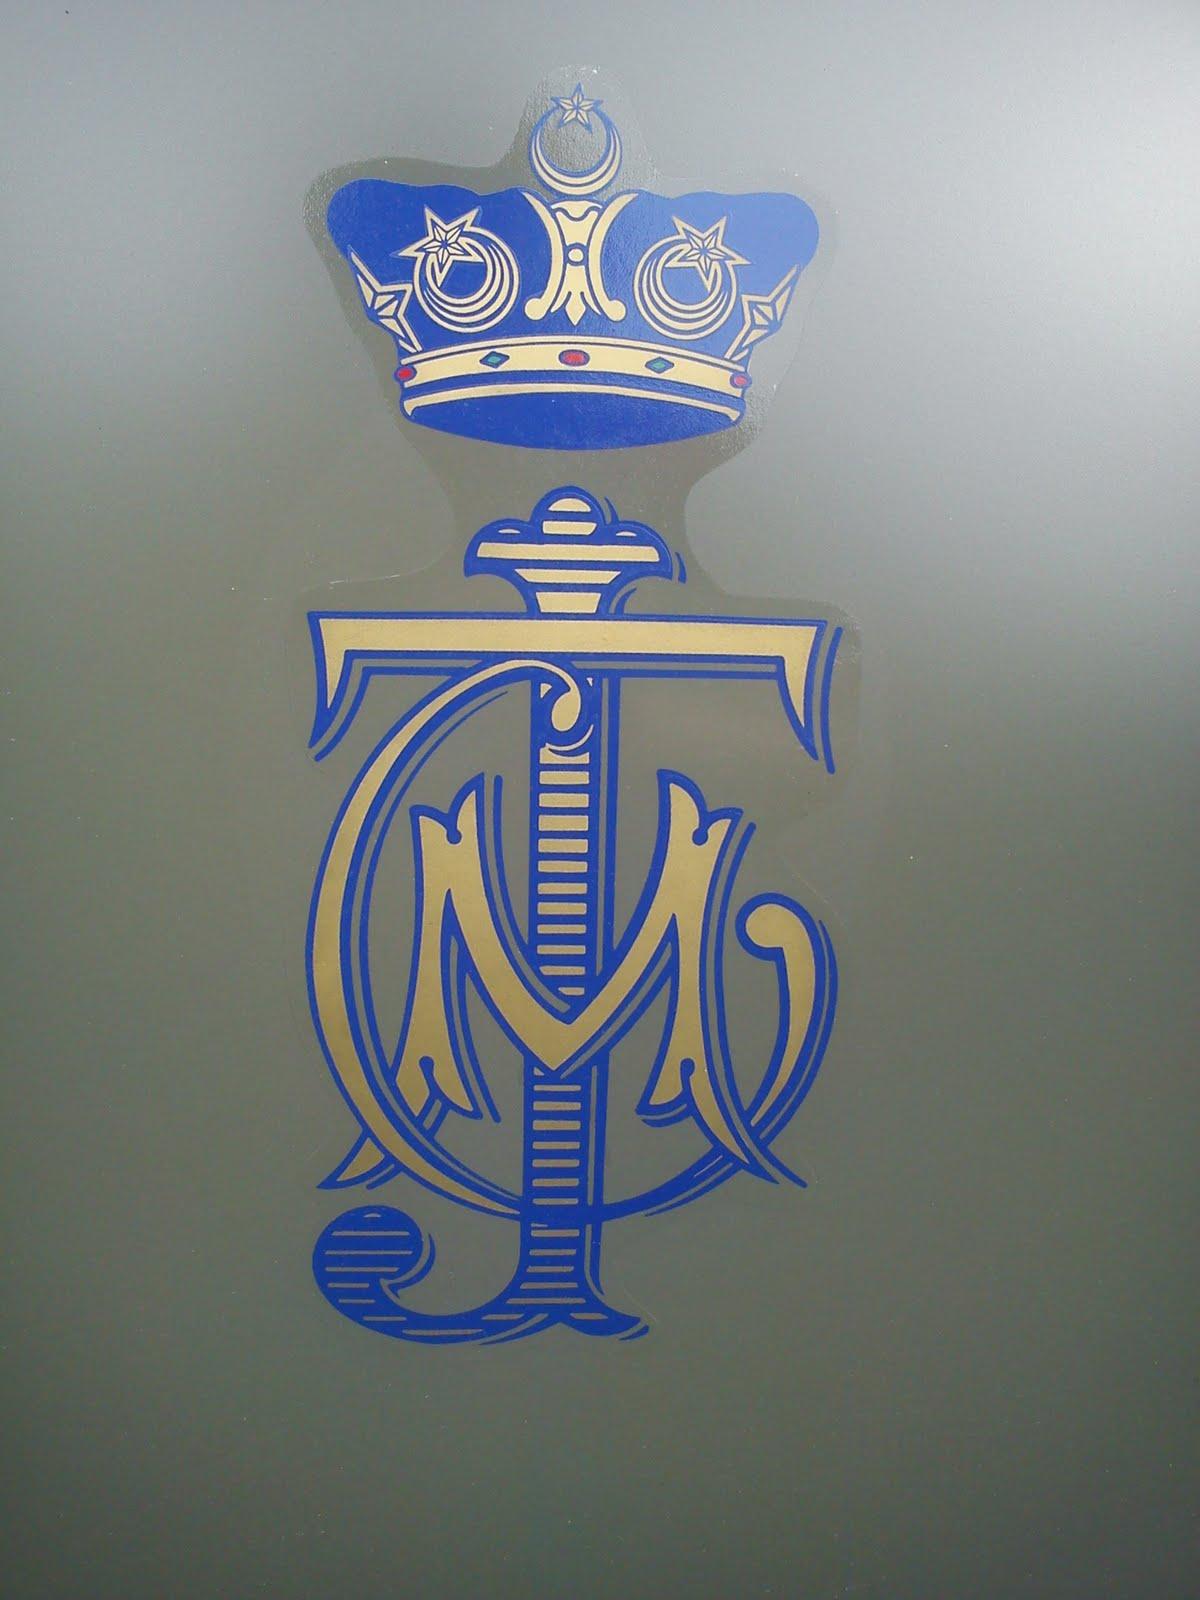 Kiri: lambang Tunku Mahkota Johor, Kanan: Lambang Timbalan Setia